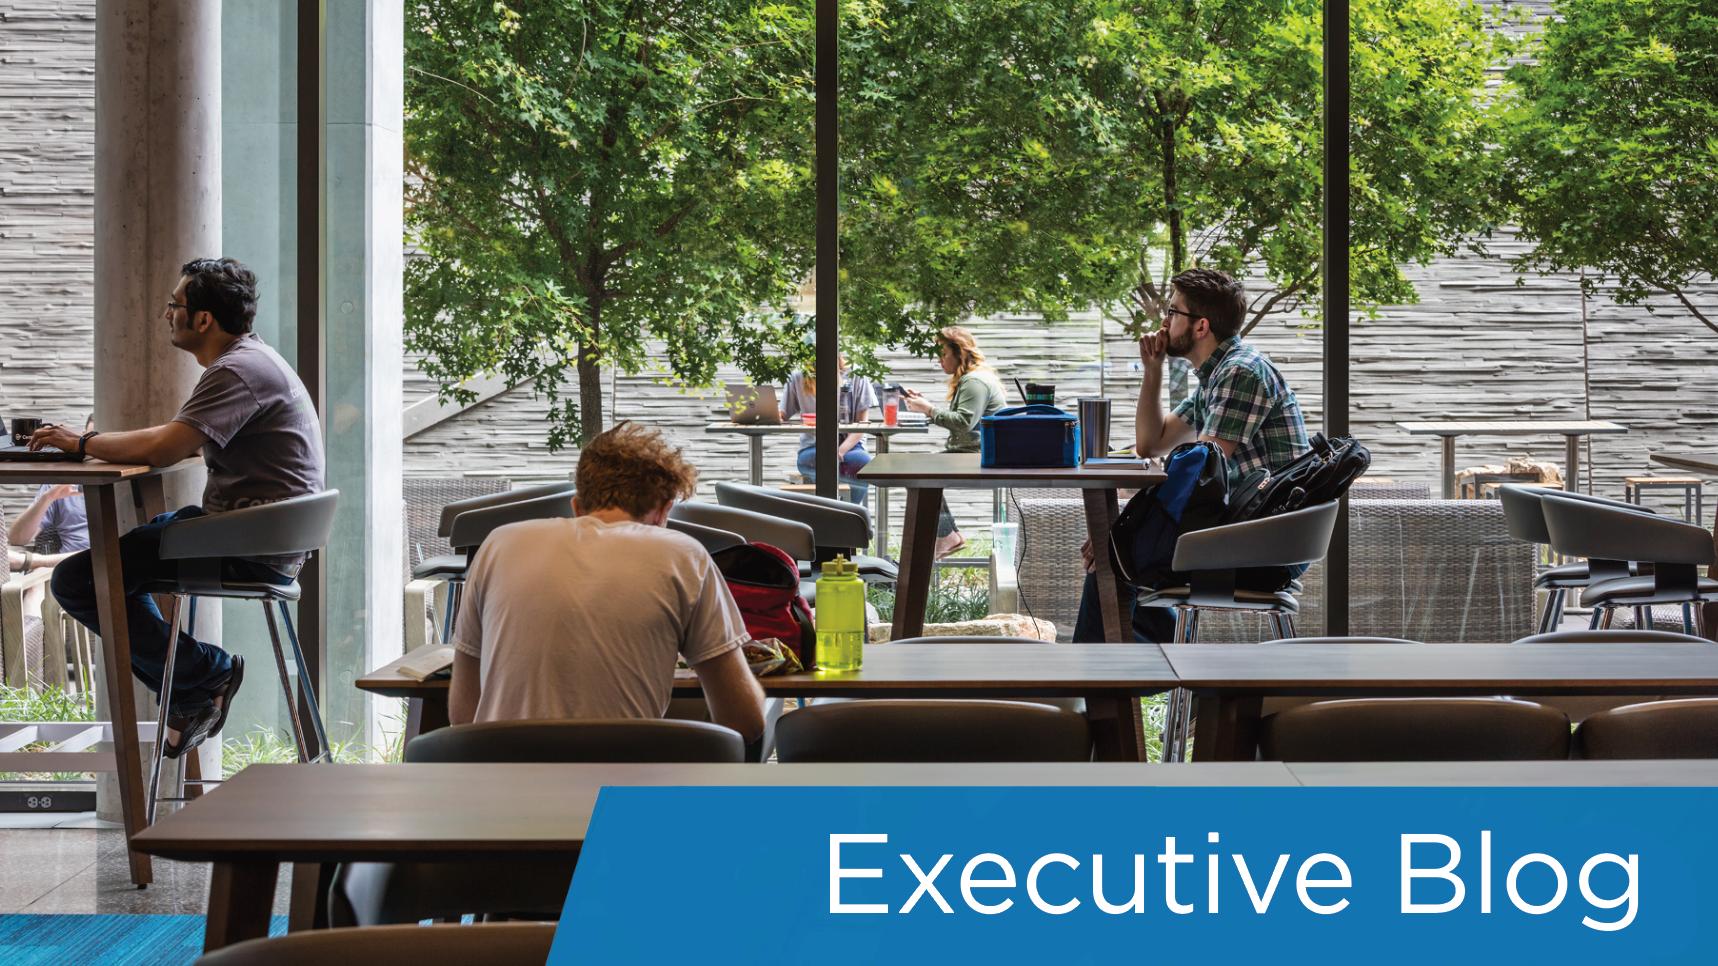 Executive blog